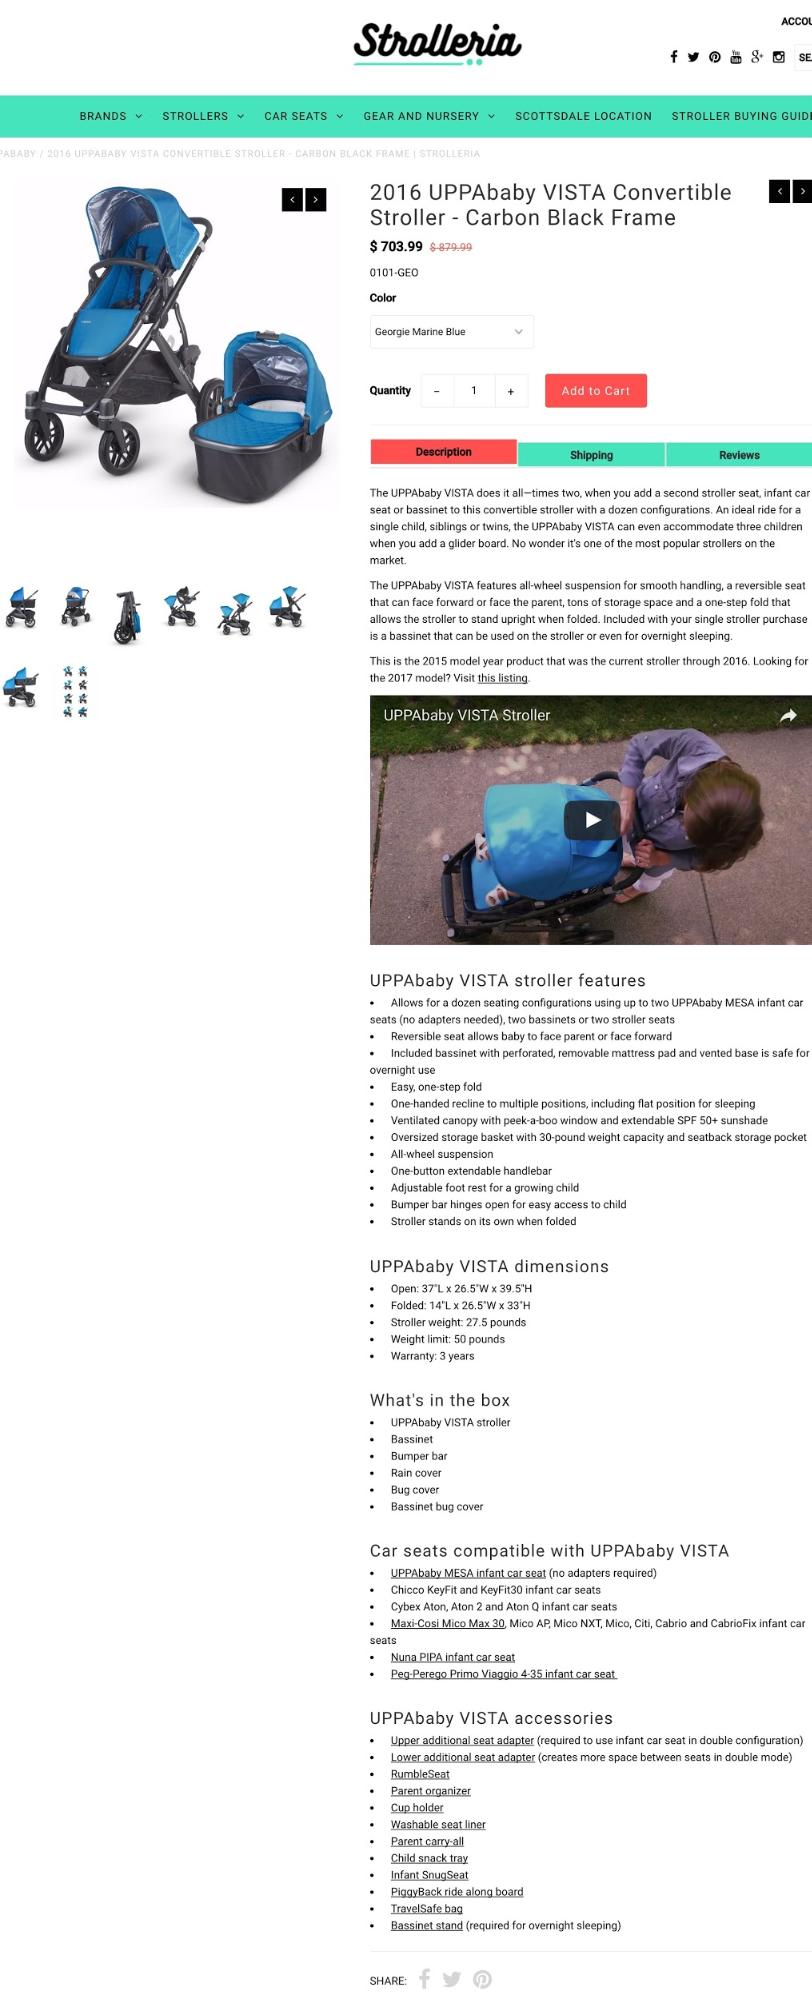 Strolleria.jpg